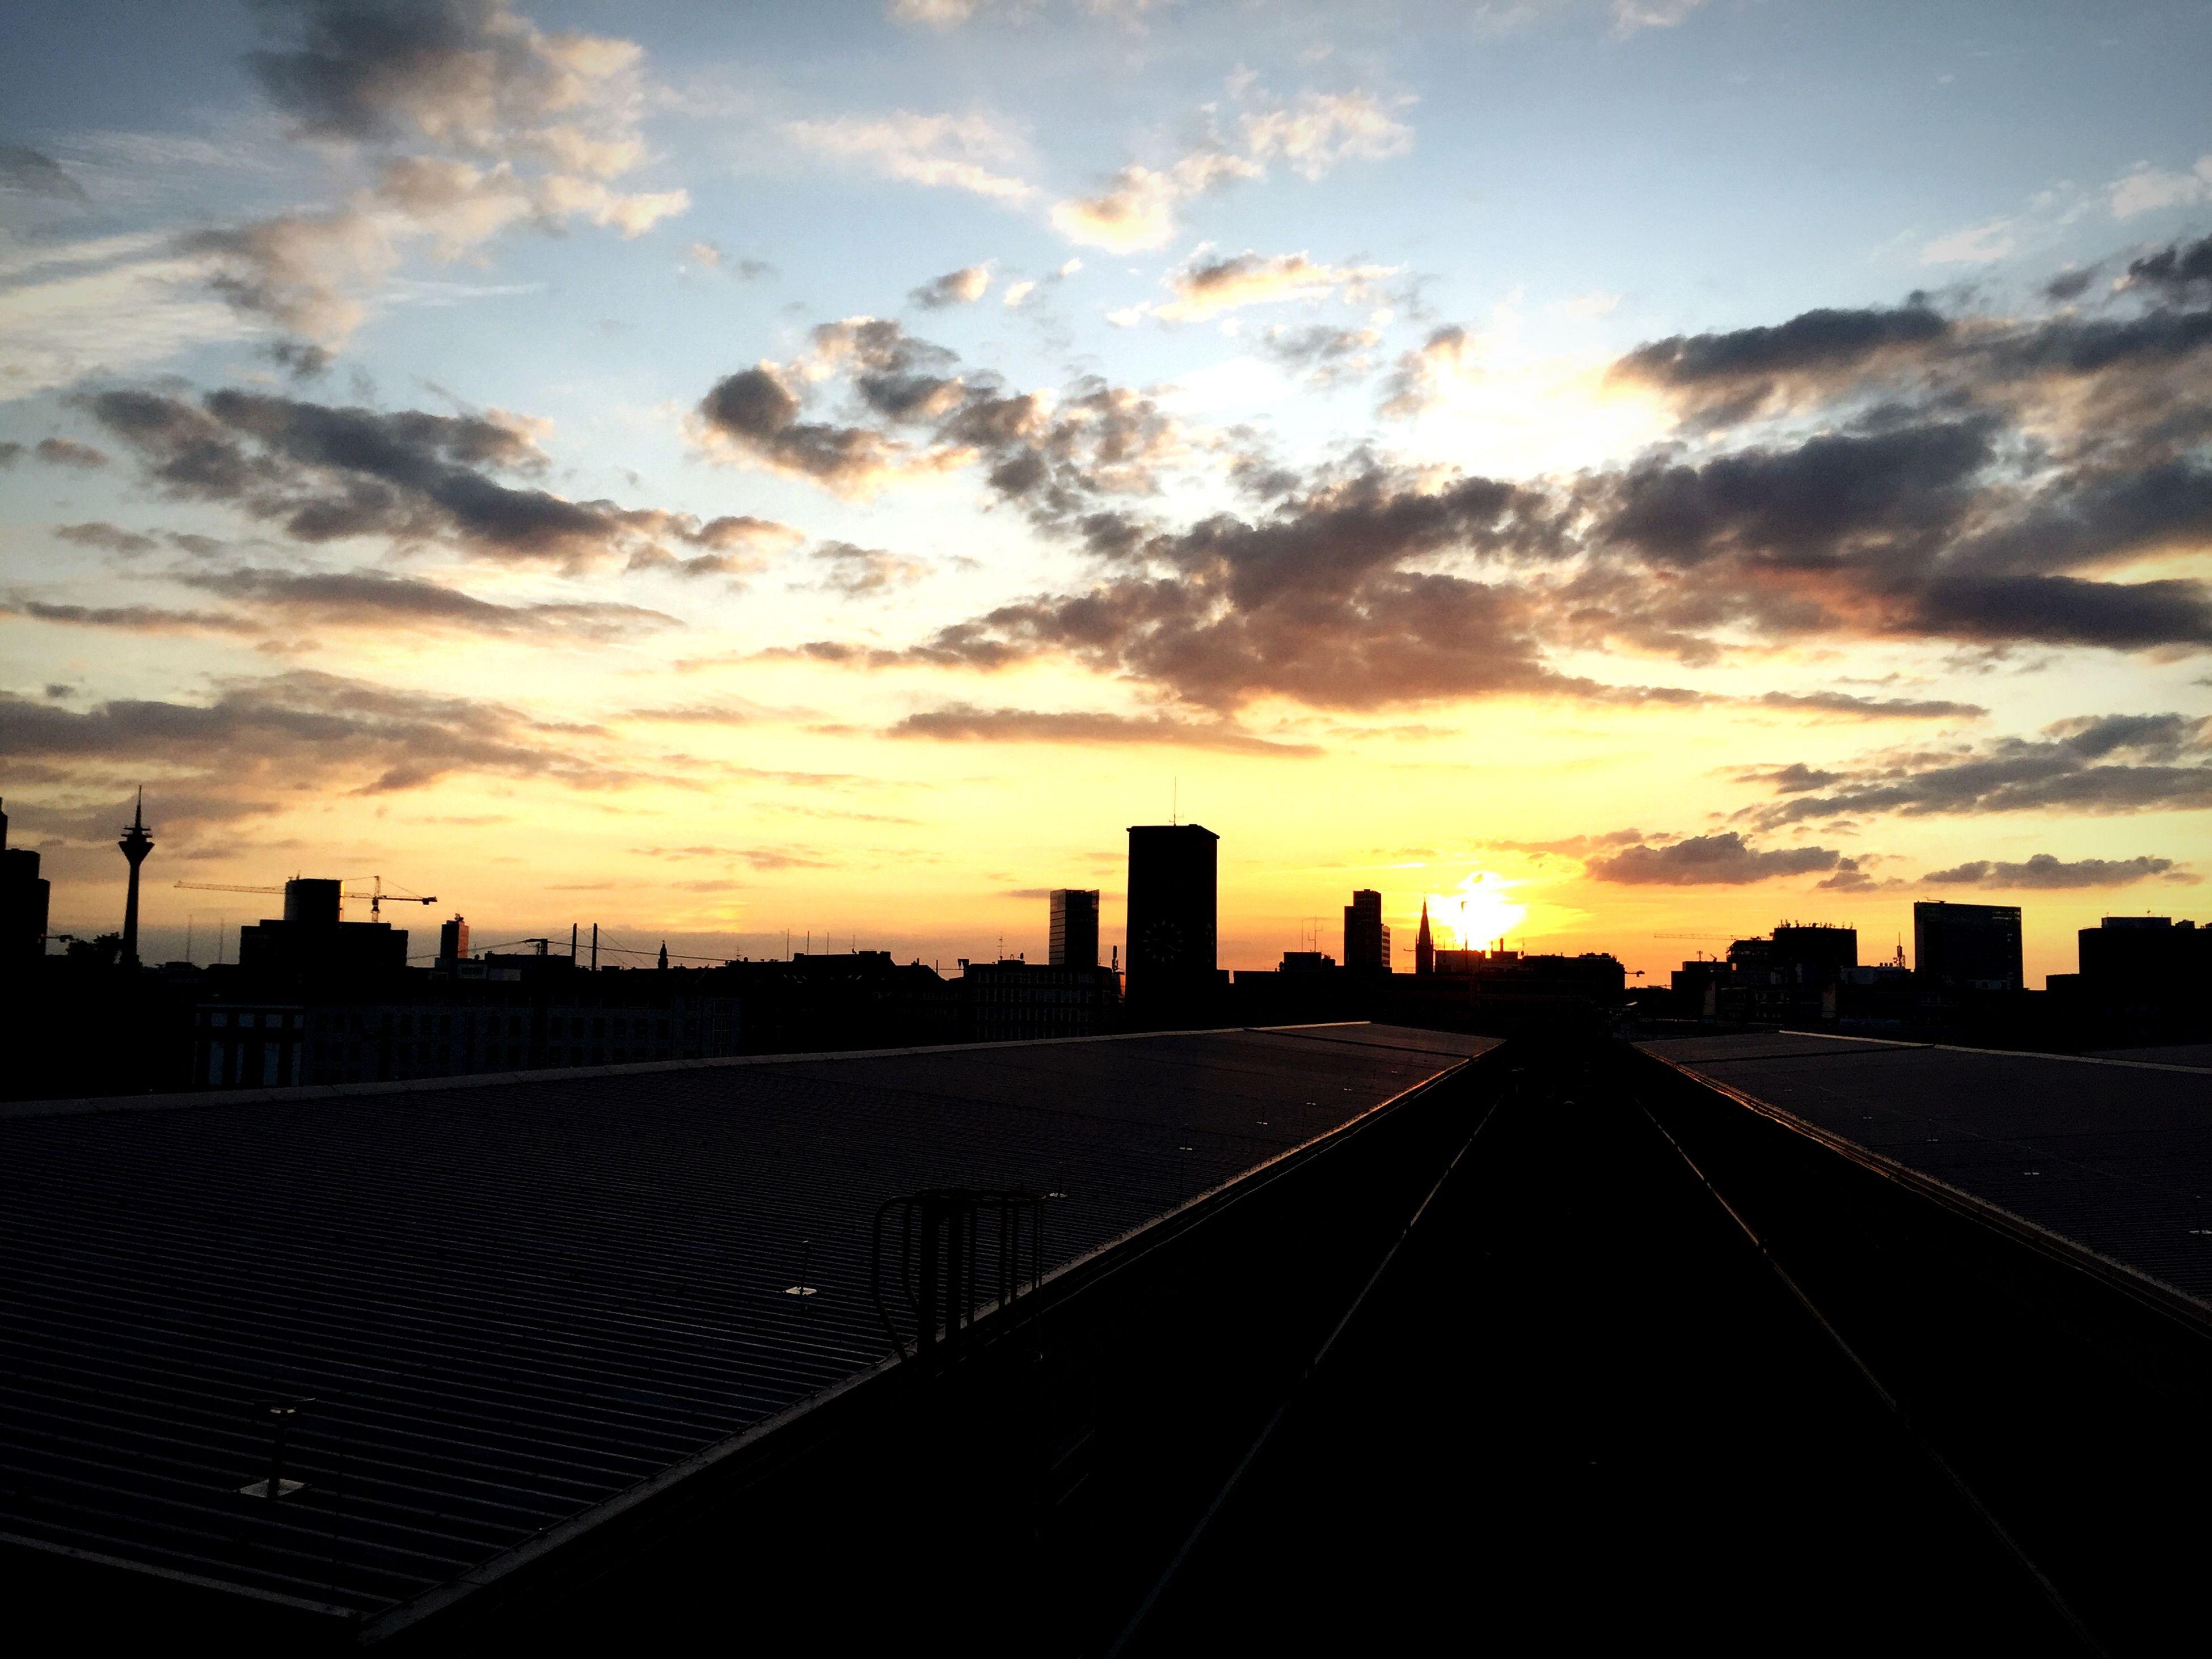 sunset, sky, silhouette, building exterior, cloud - sky, built structure, architecture, orange color, cloud, the way forward, cloudy, city, dramatic sky, scenics, dusk, diminishing perspective, outdoors, landscape, nature, sunlight